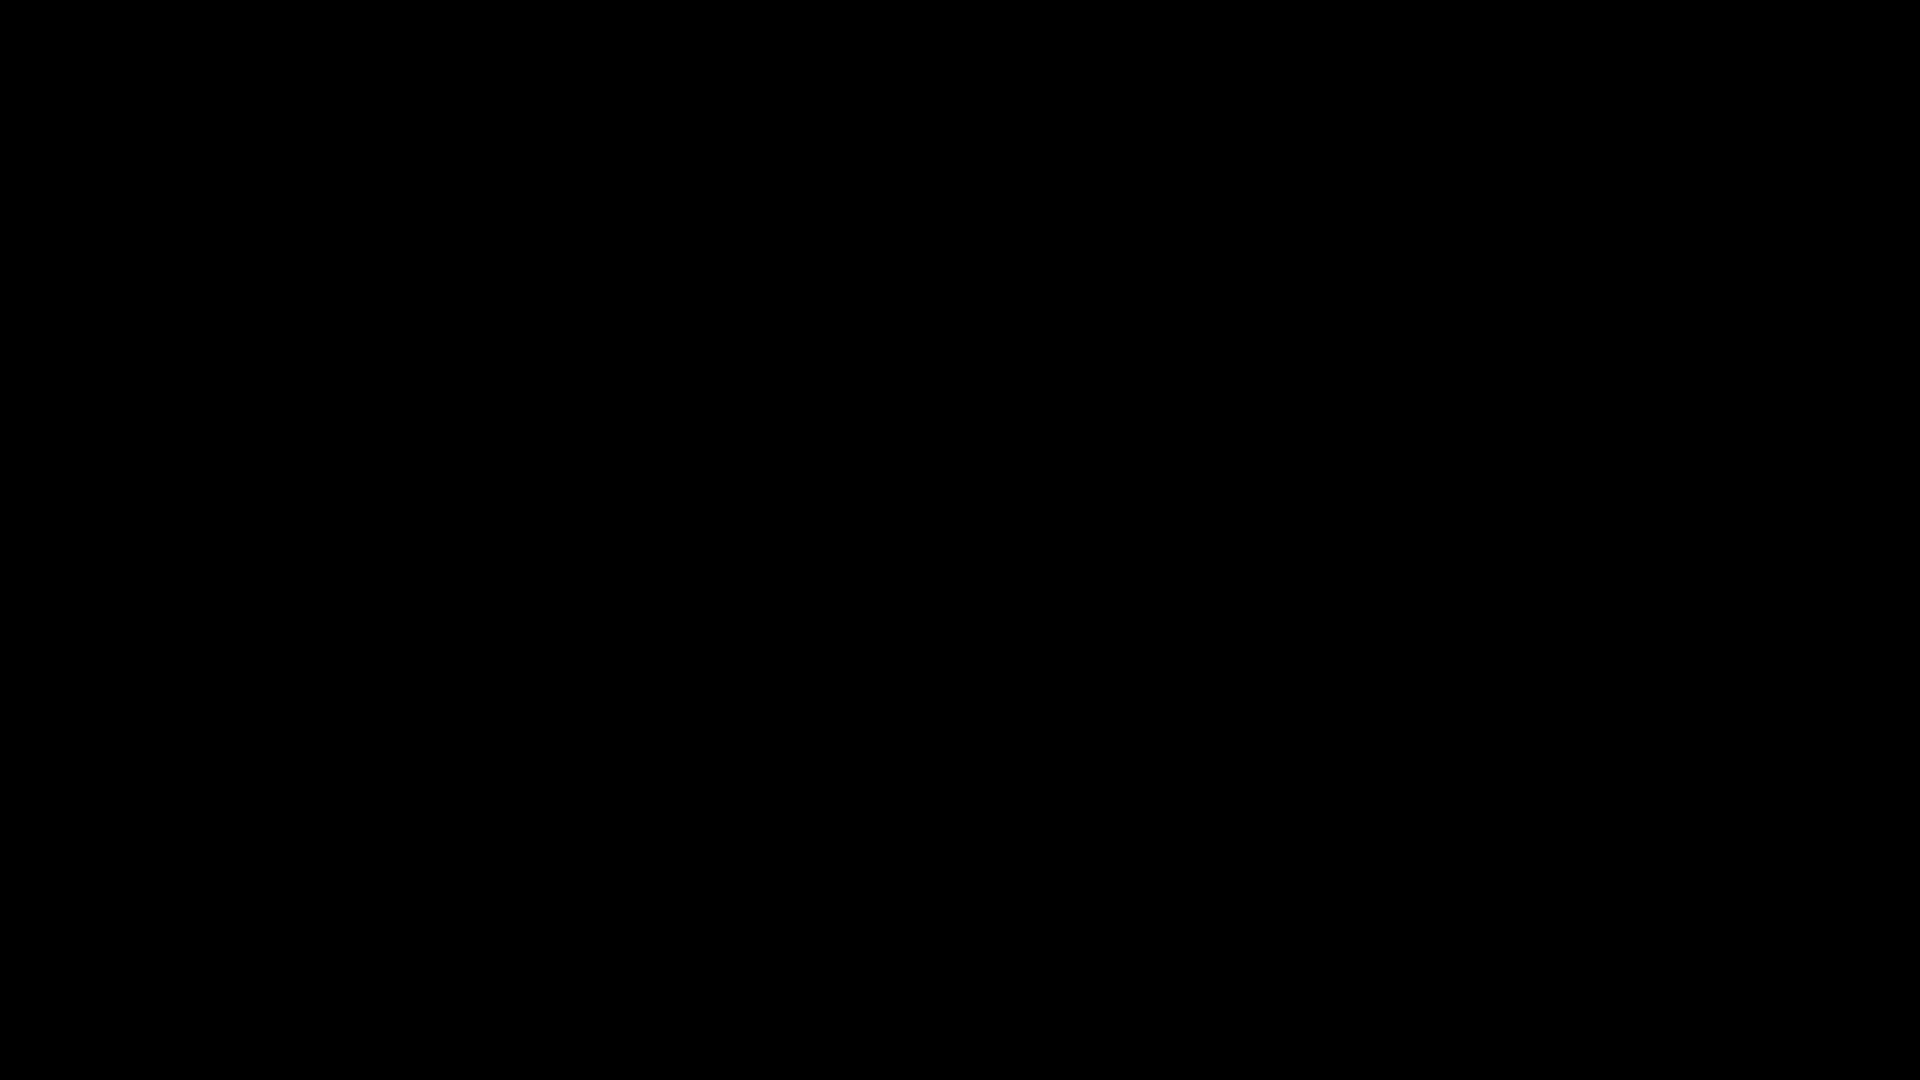 ableton tutorial, ambient, armin van buuren, dj tiesto, electronica, fl studio, how to make trance, john haughey, luke pn, magic earth tunes, orjan nilsen, paradise, progressive house, progressive trance, sidechain, the best of, trance, vocal trance, wormhole, STEEM - Acallaris (Orignal Mix)HD GIFs